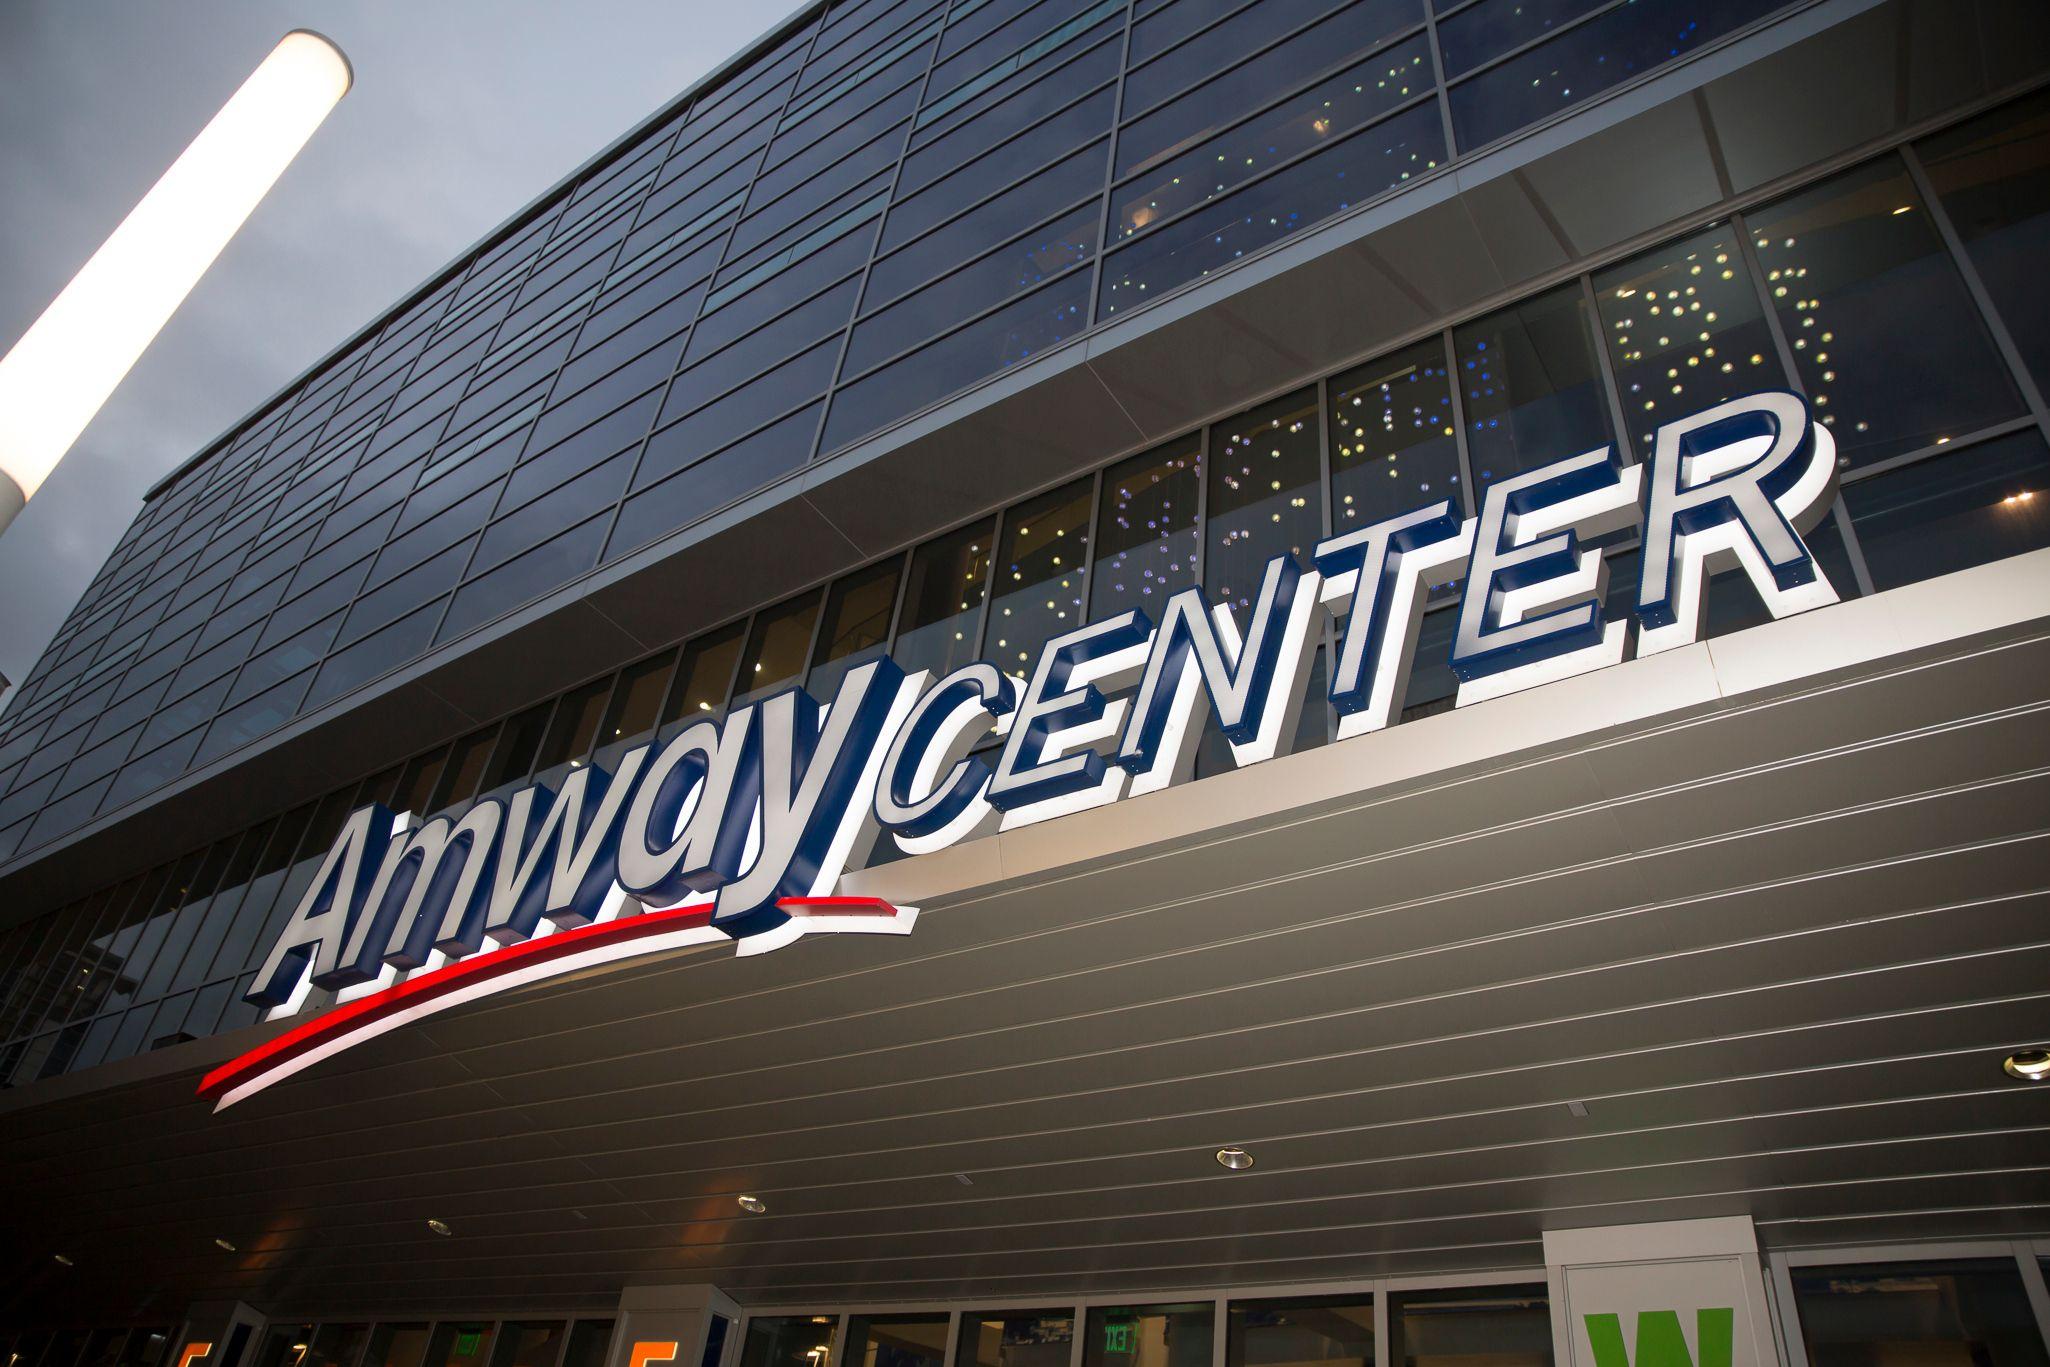 Amway Center, host of the 2013 Budweiser Gala